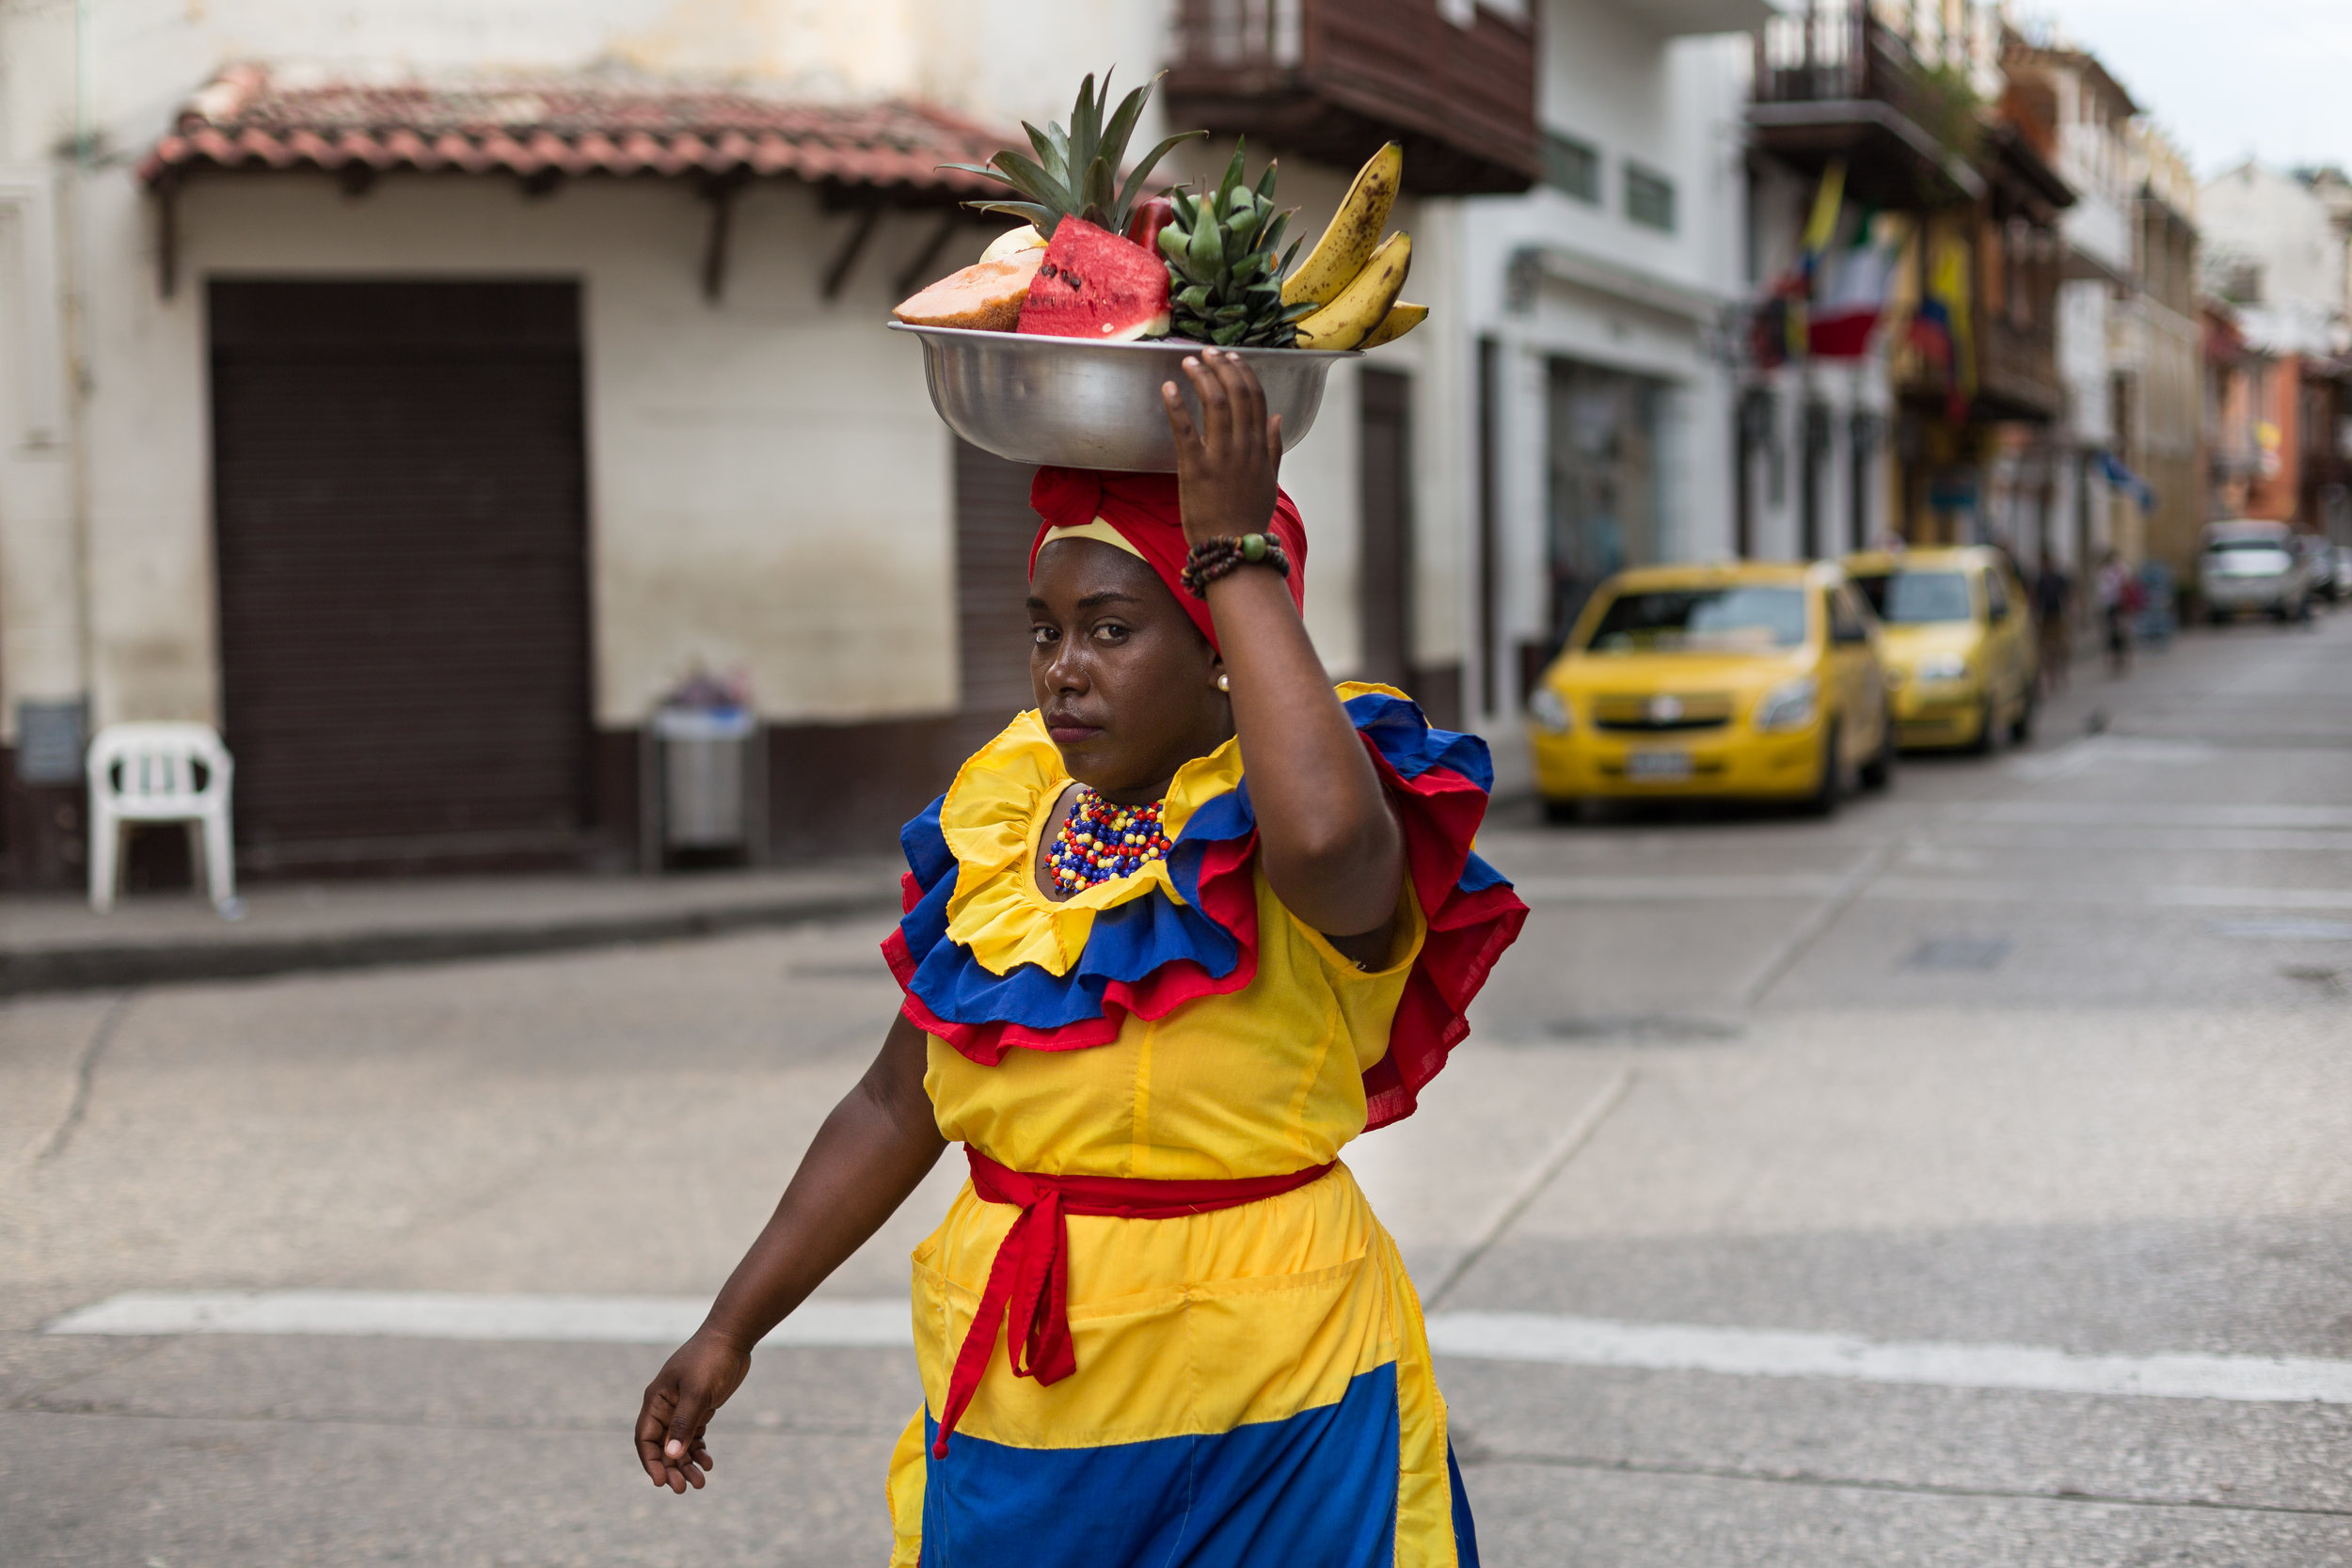 Colombia_Cartegena_2017_7.JPG